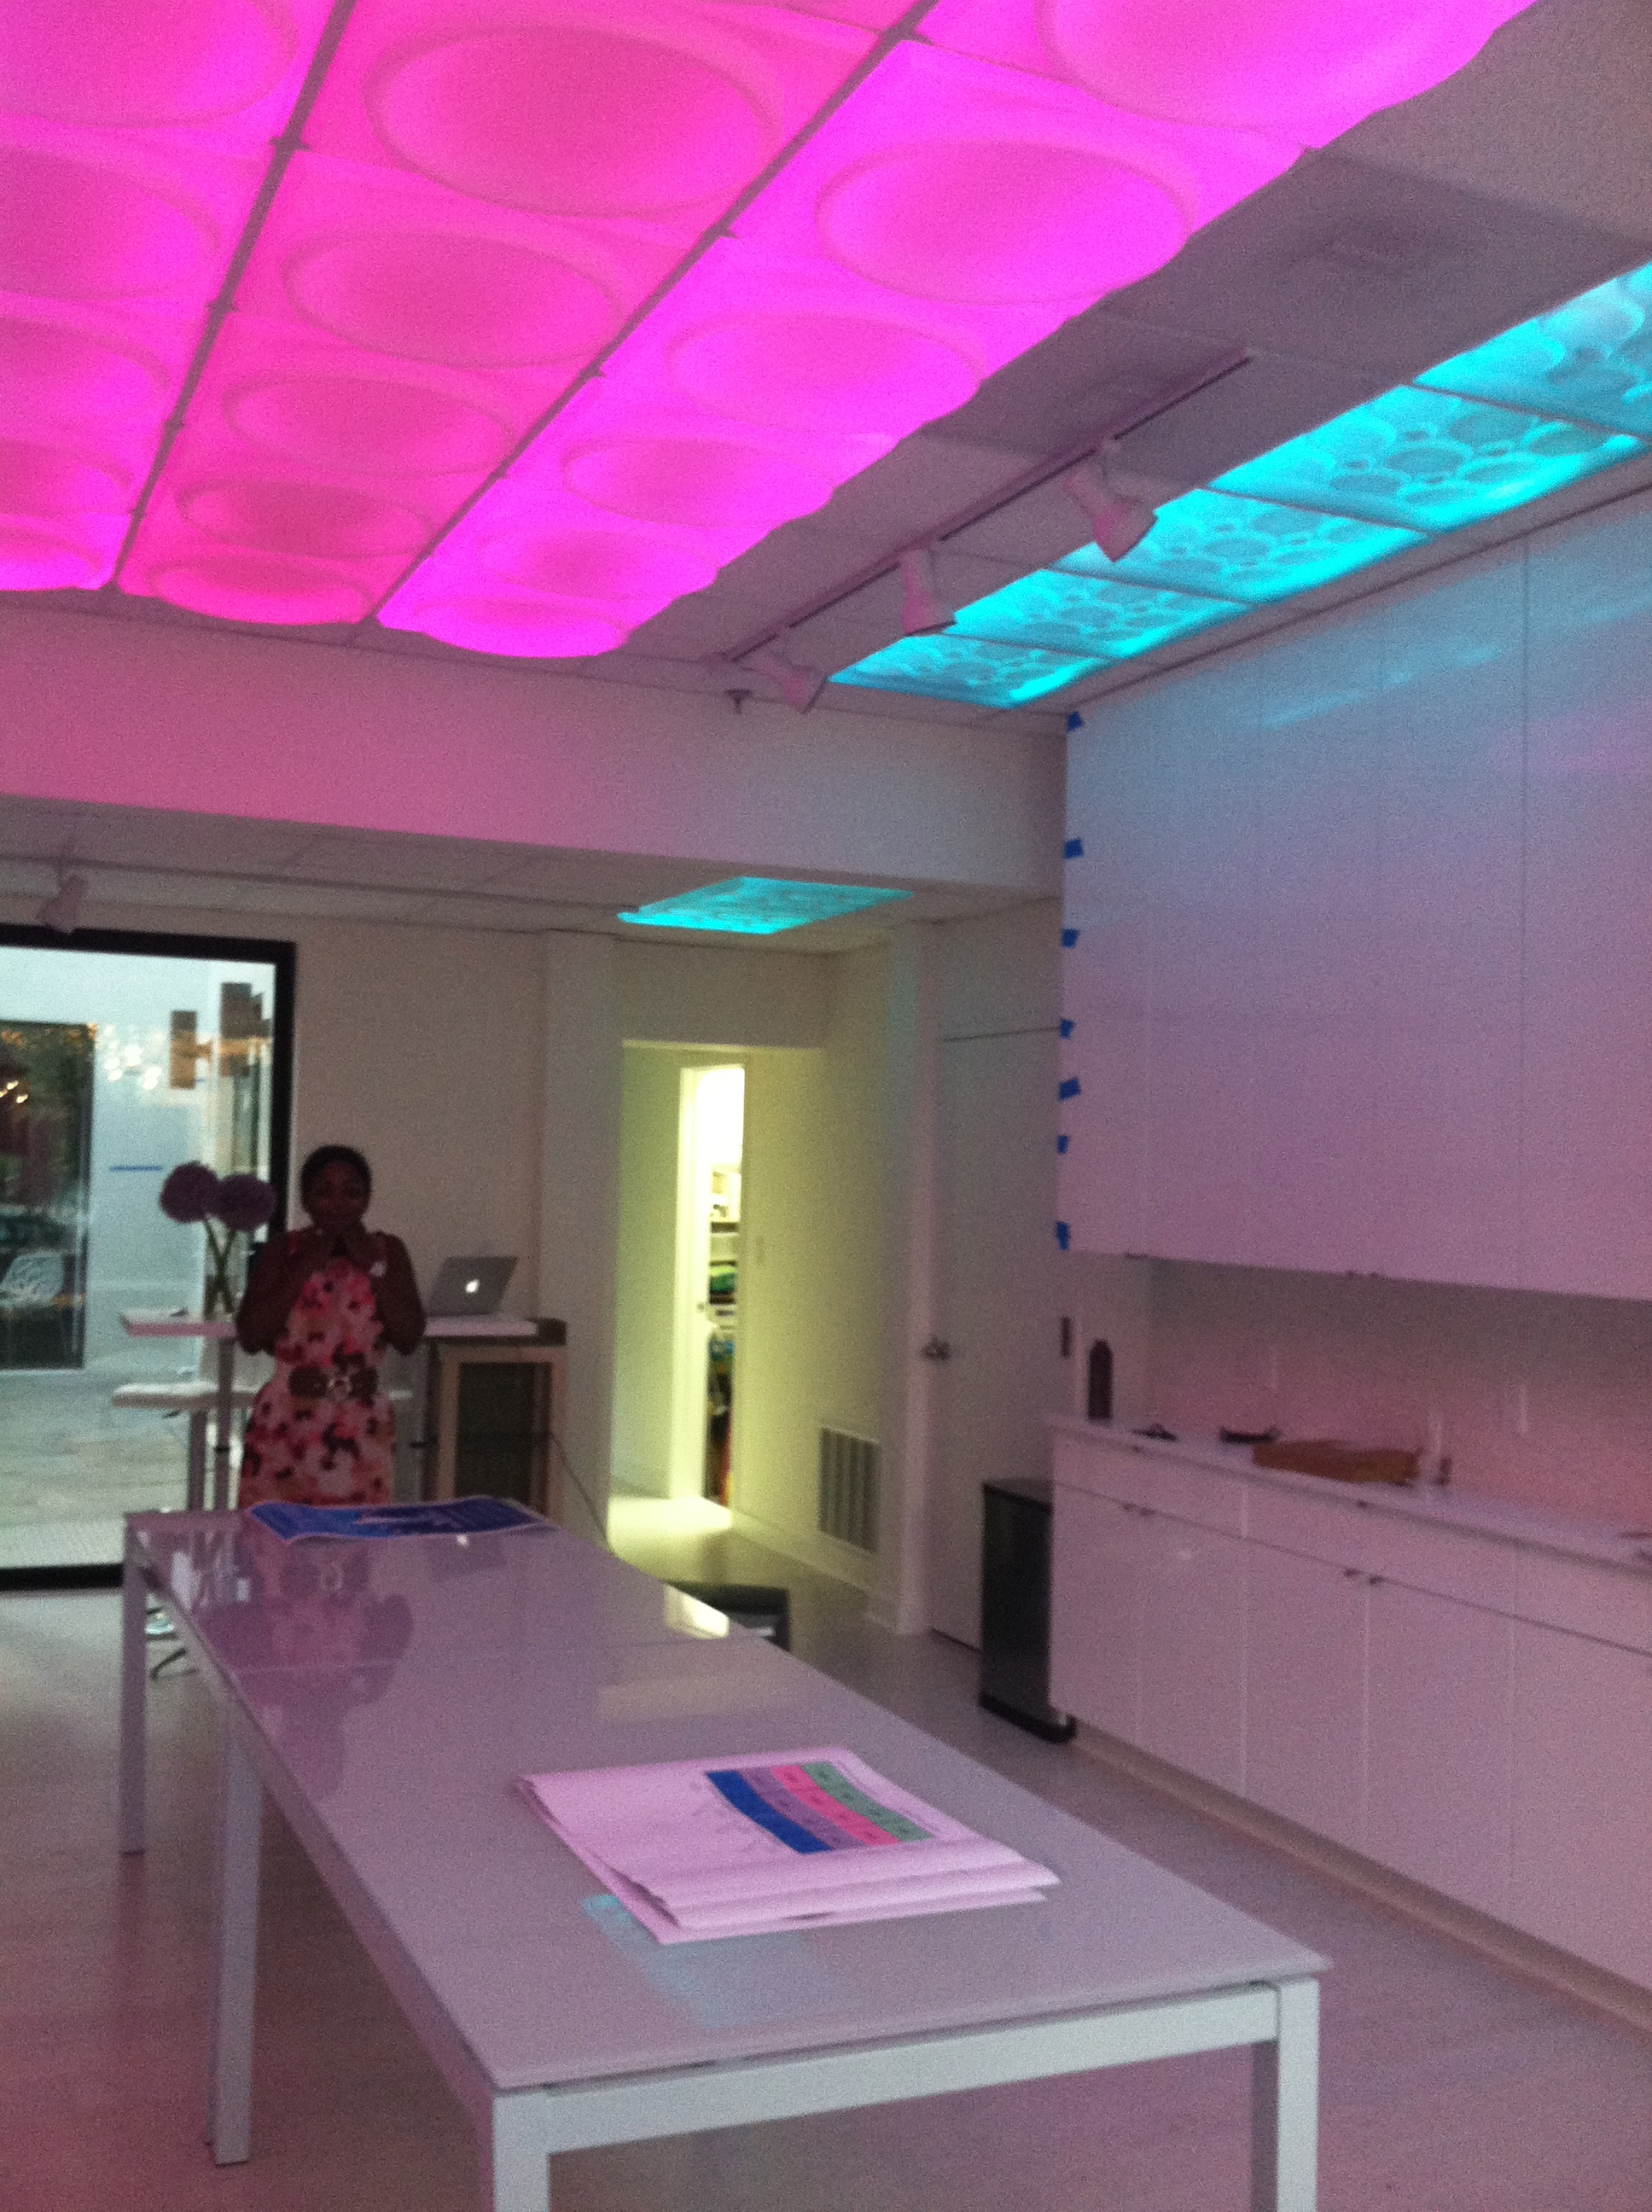 RGB LED Strip Lights - 12V LED Tape Light w/ LC4 Connector - 122 Lumens/ft.